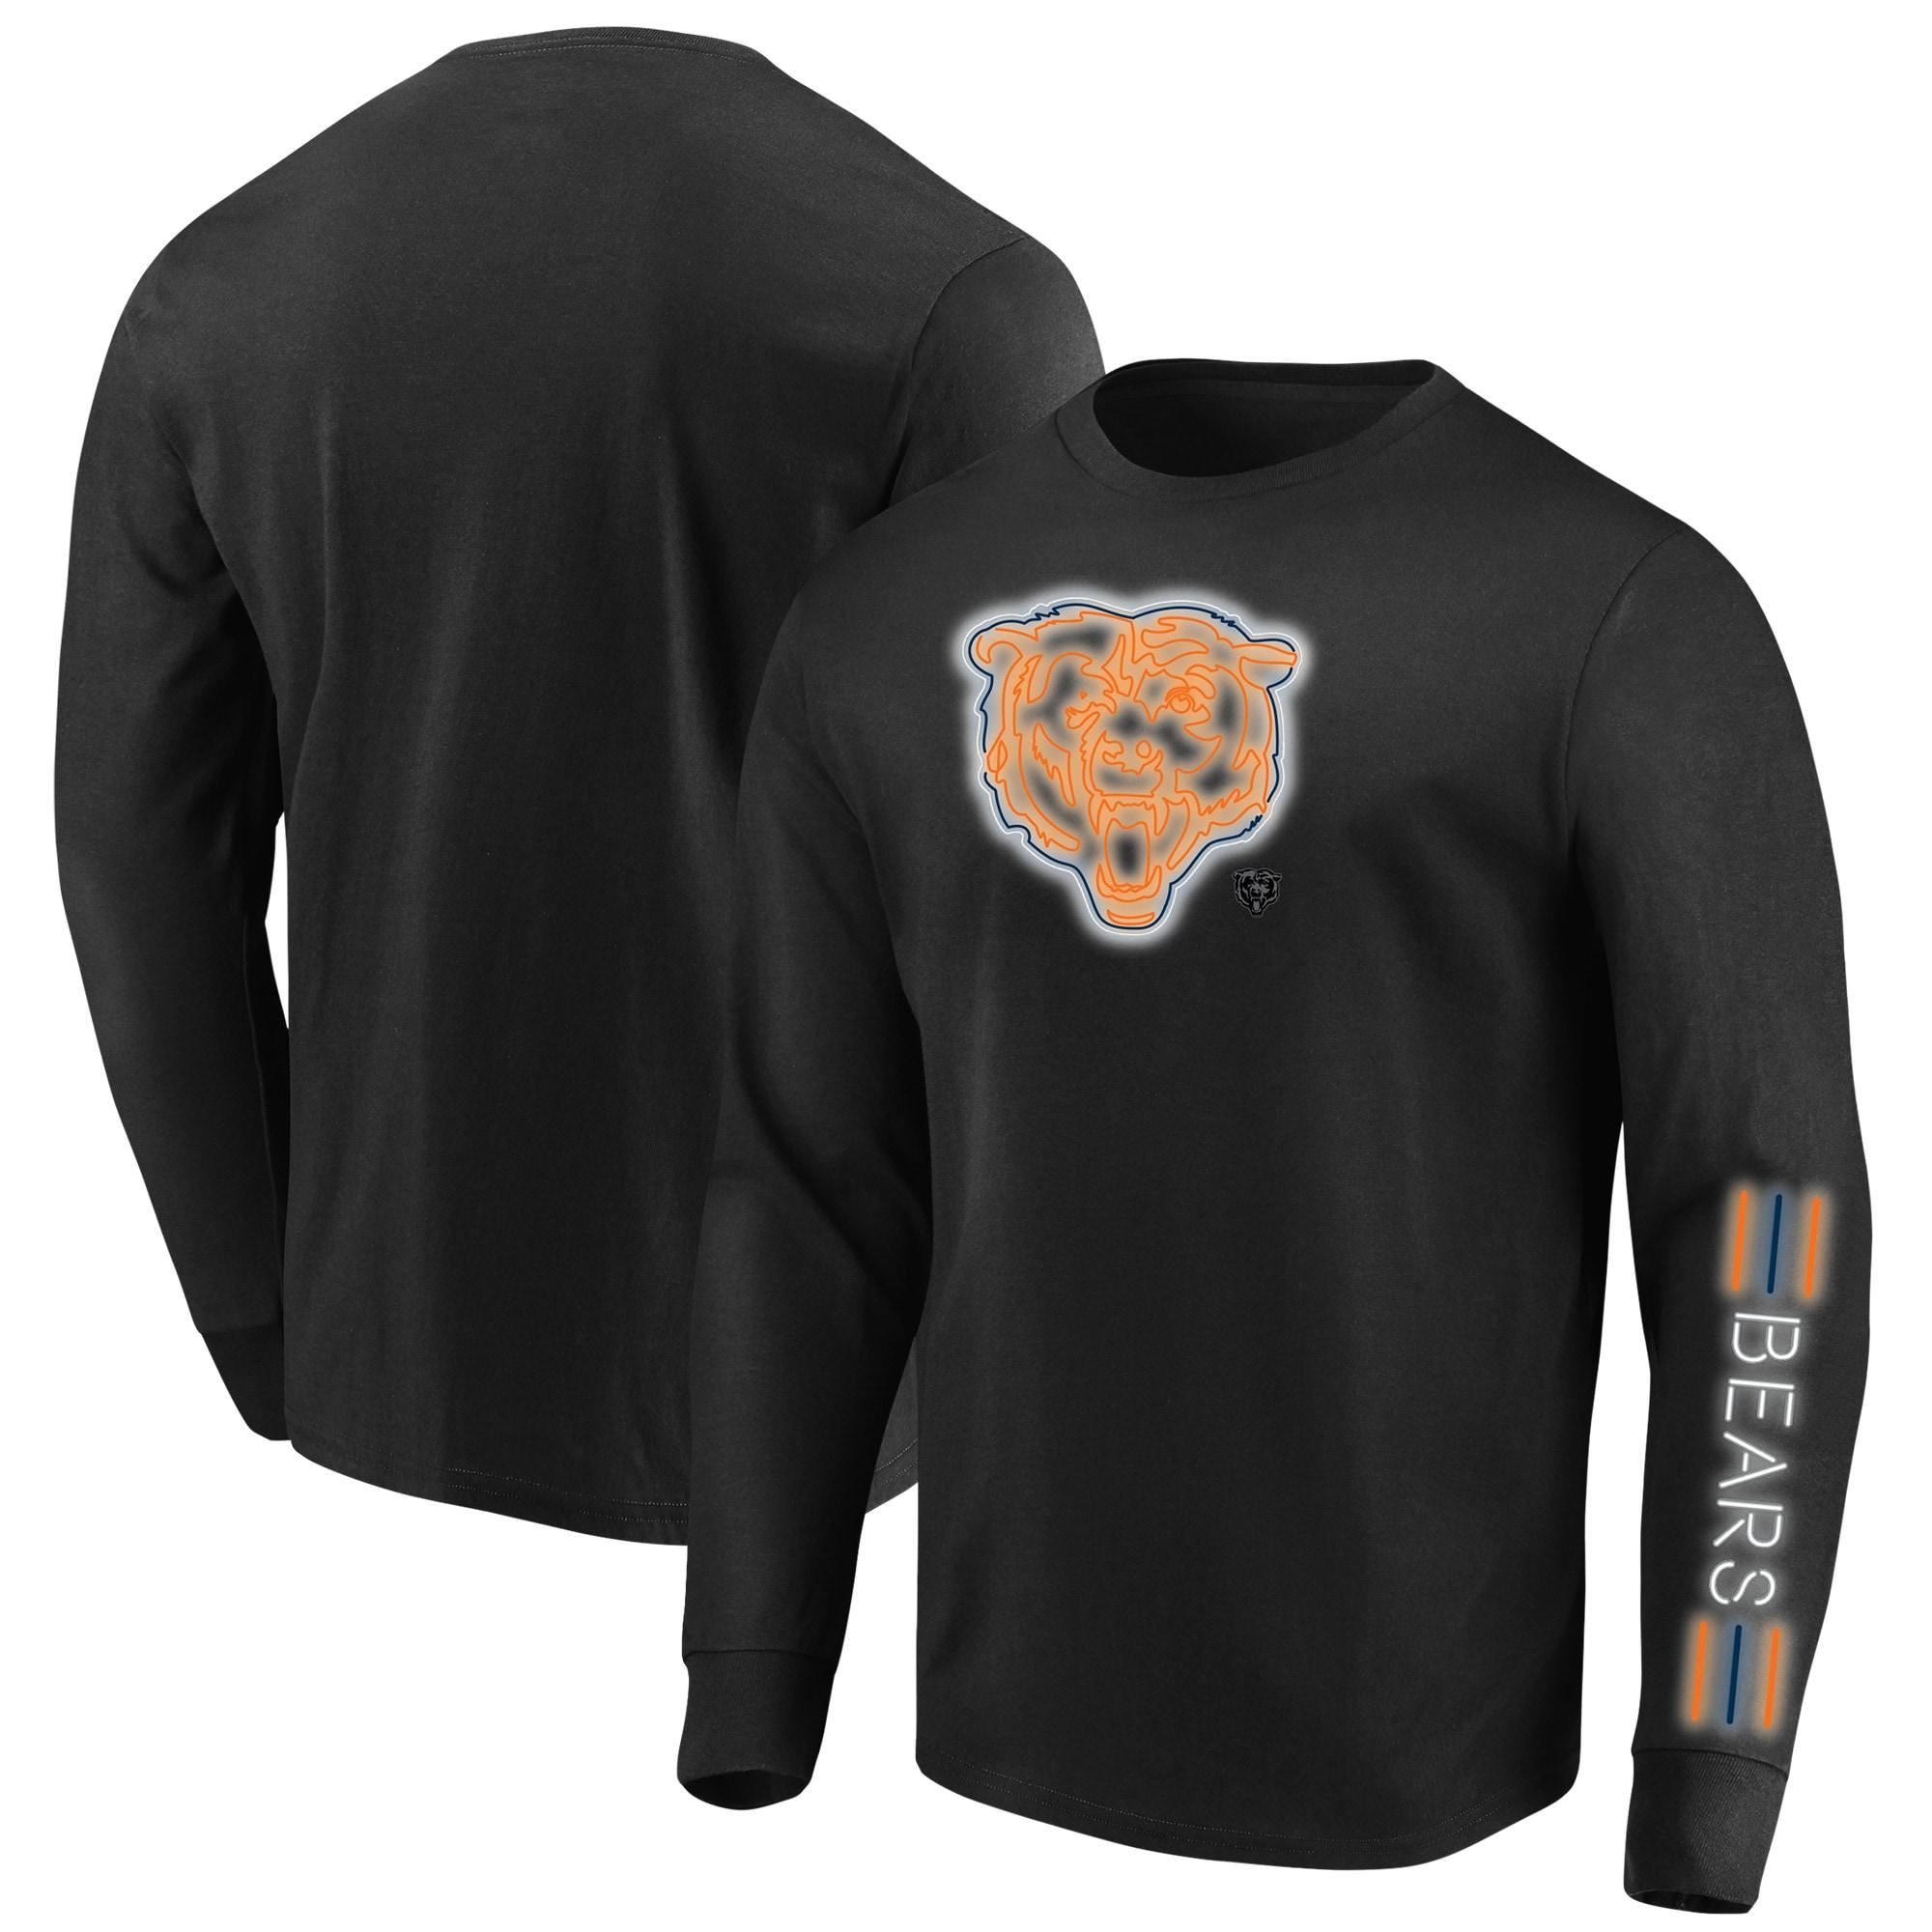 Chicago Bears Majestic Big & Tall Startling Success Long Sleeve T-Shirt - Black